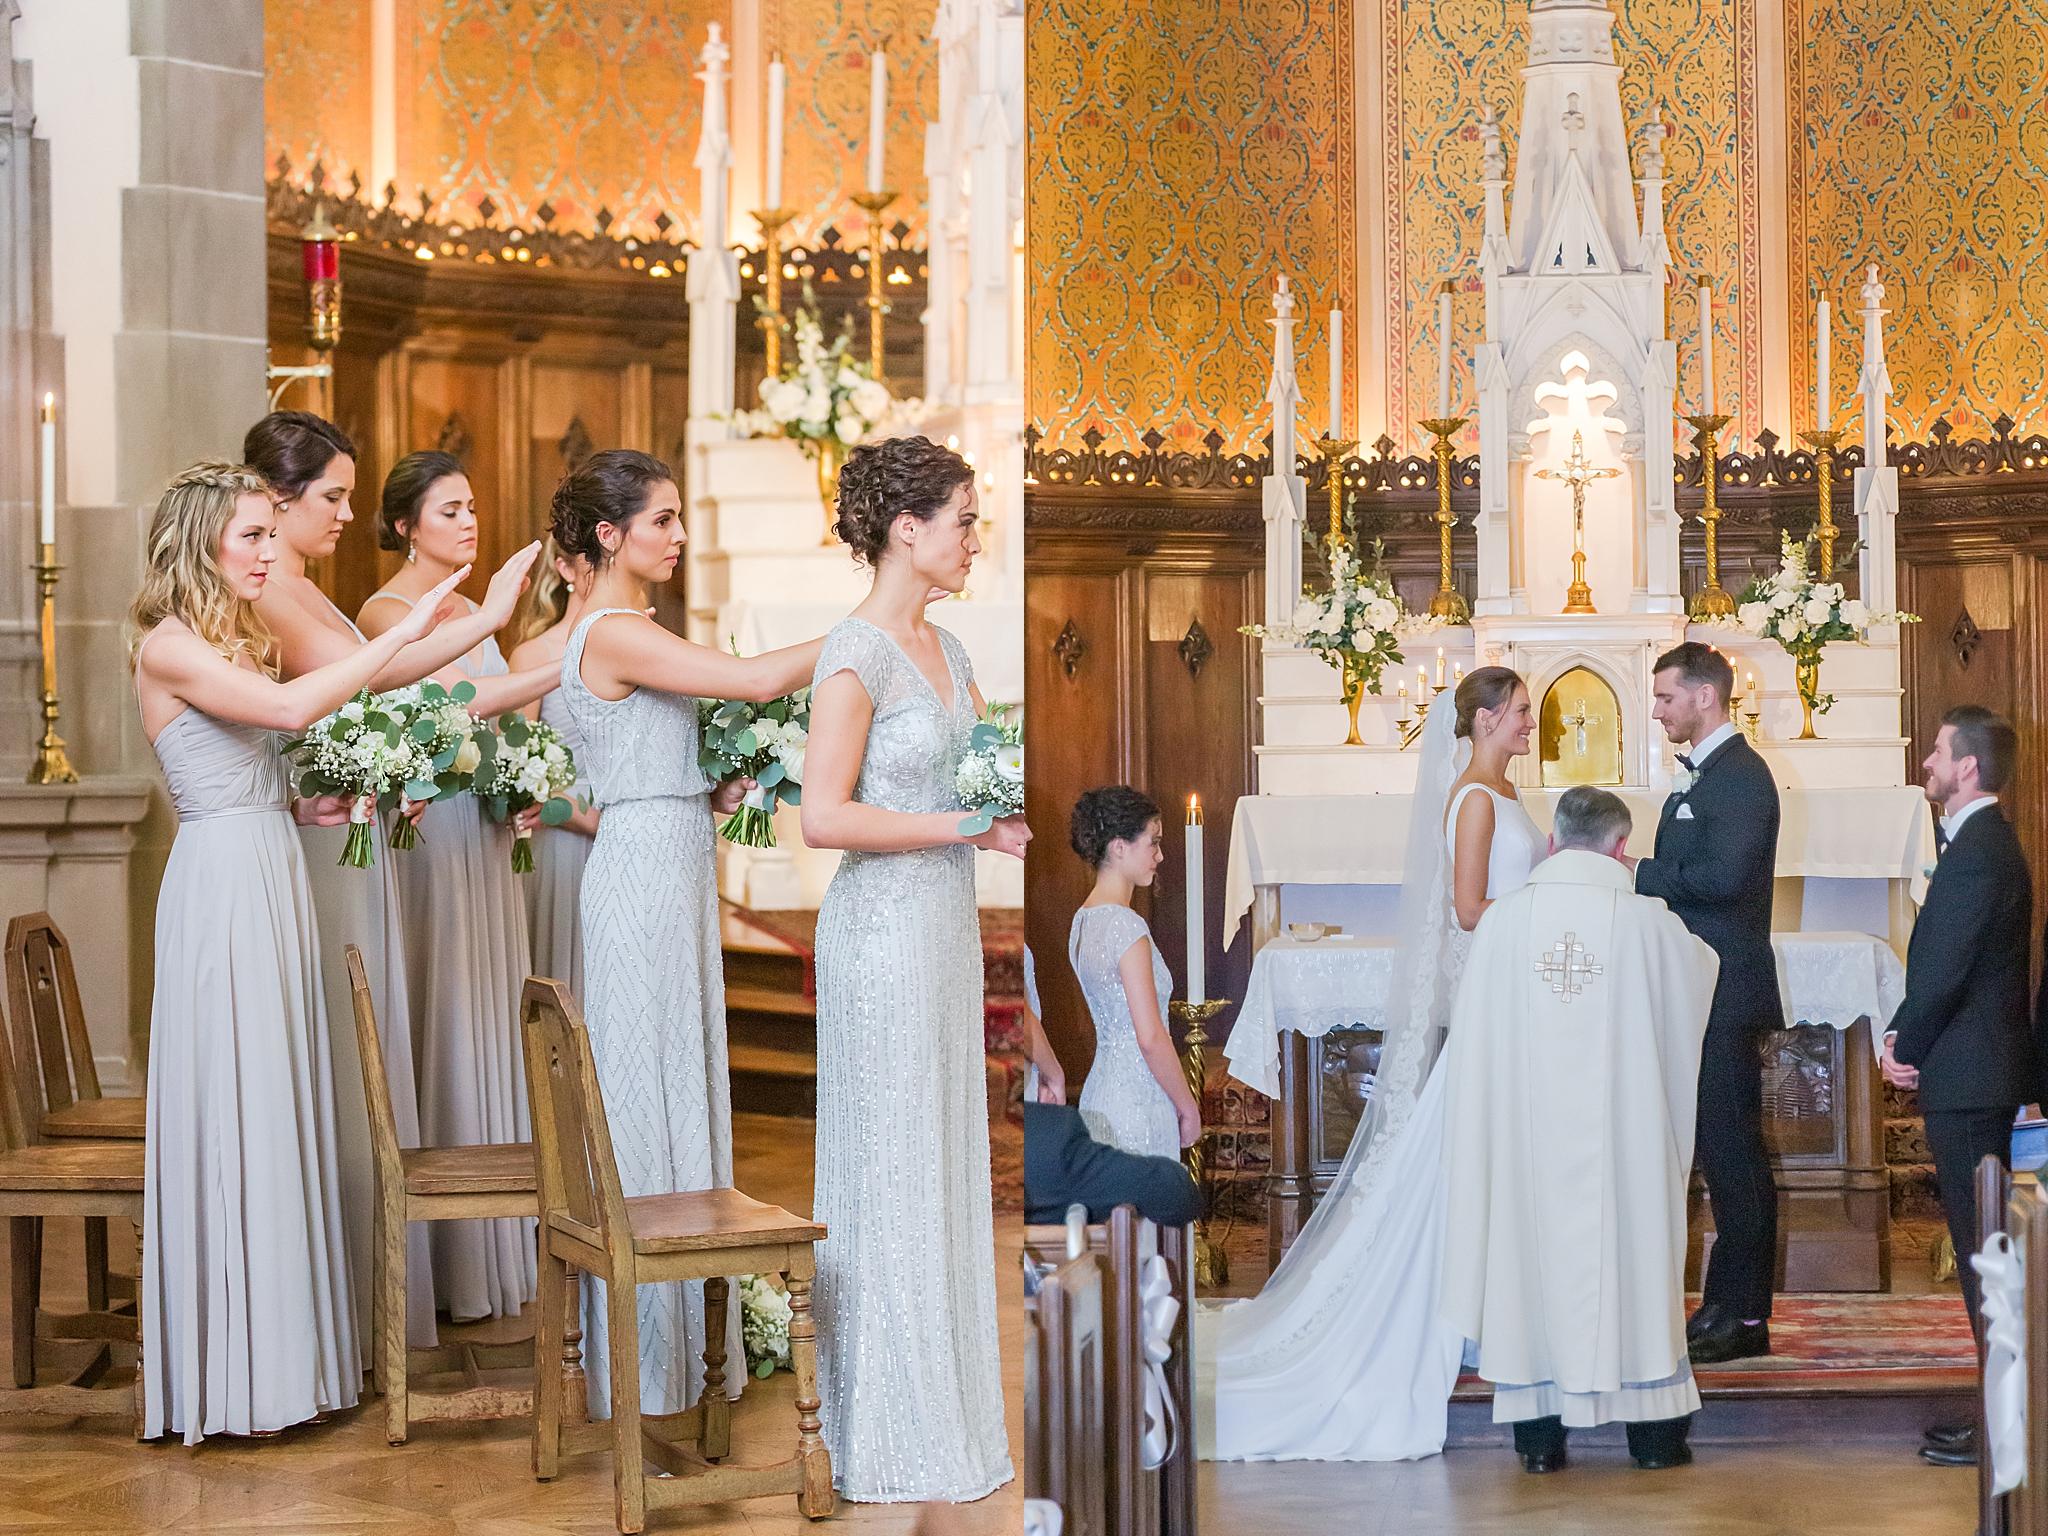 detroit-wedding-photographer-grosse-pointe-academy-chapel-detroit-golf-club-wedding-carly-matt-by-courtney-carolyn-photography_0044.jpg